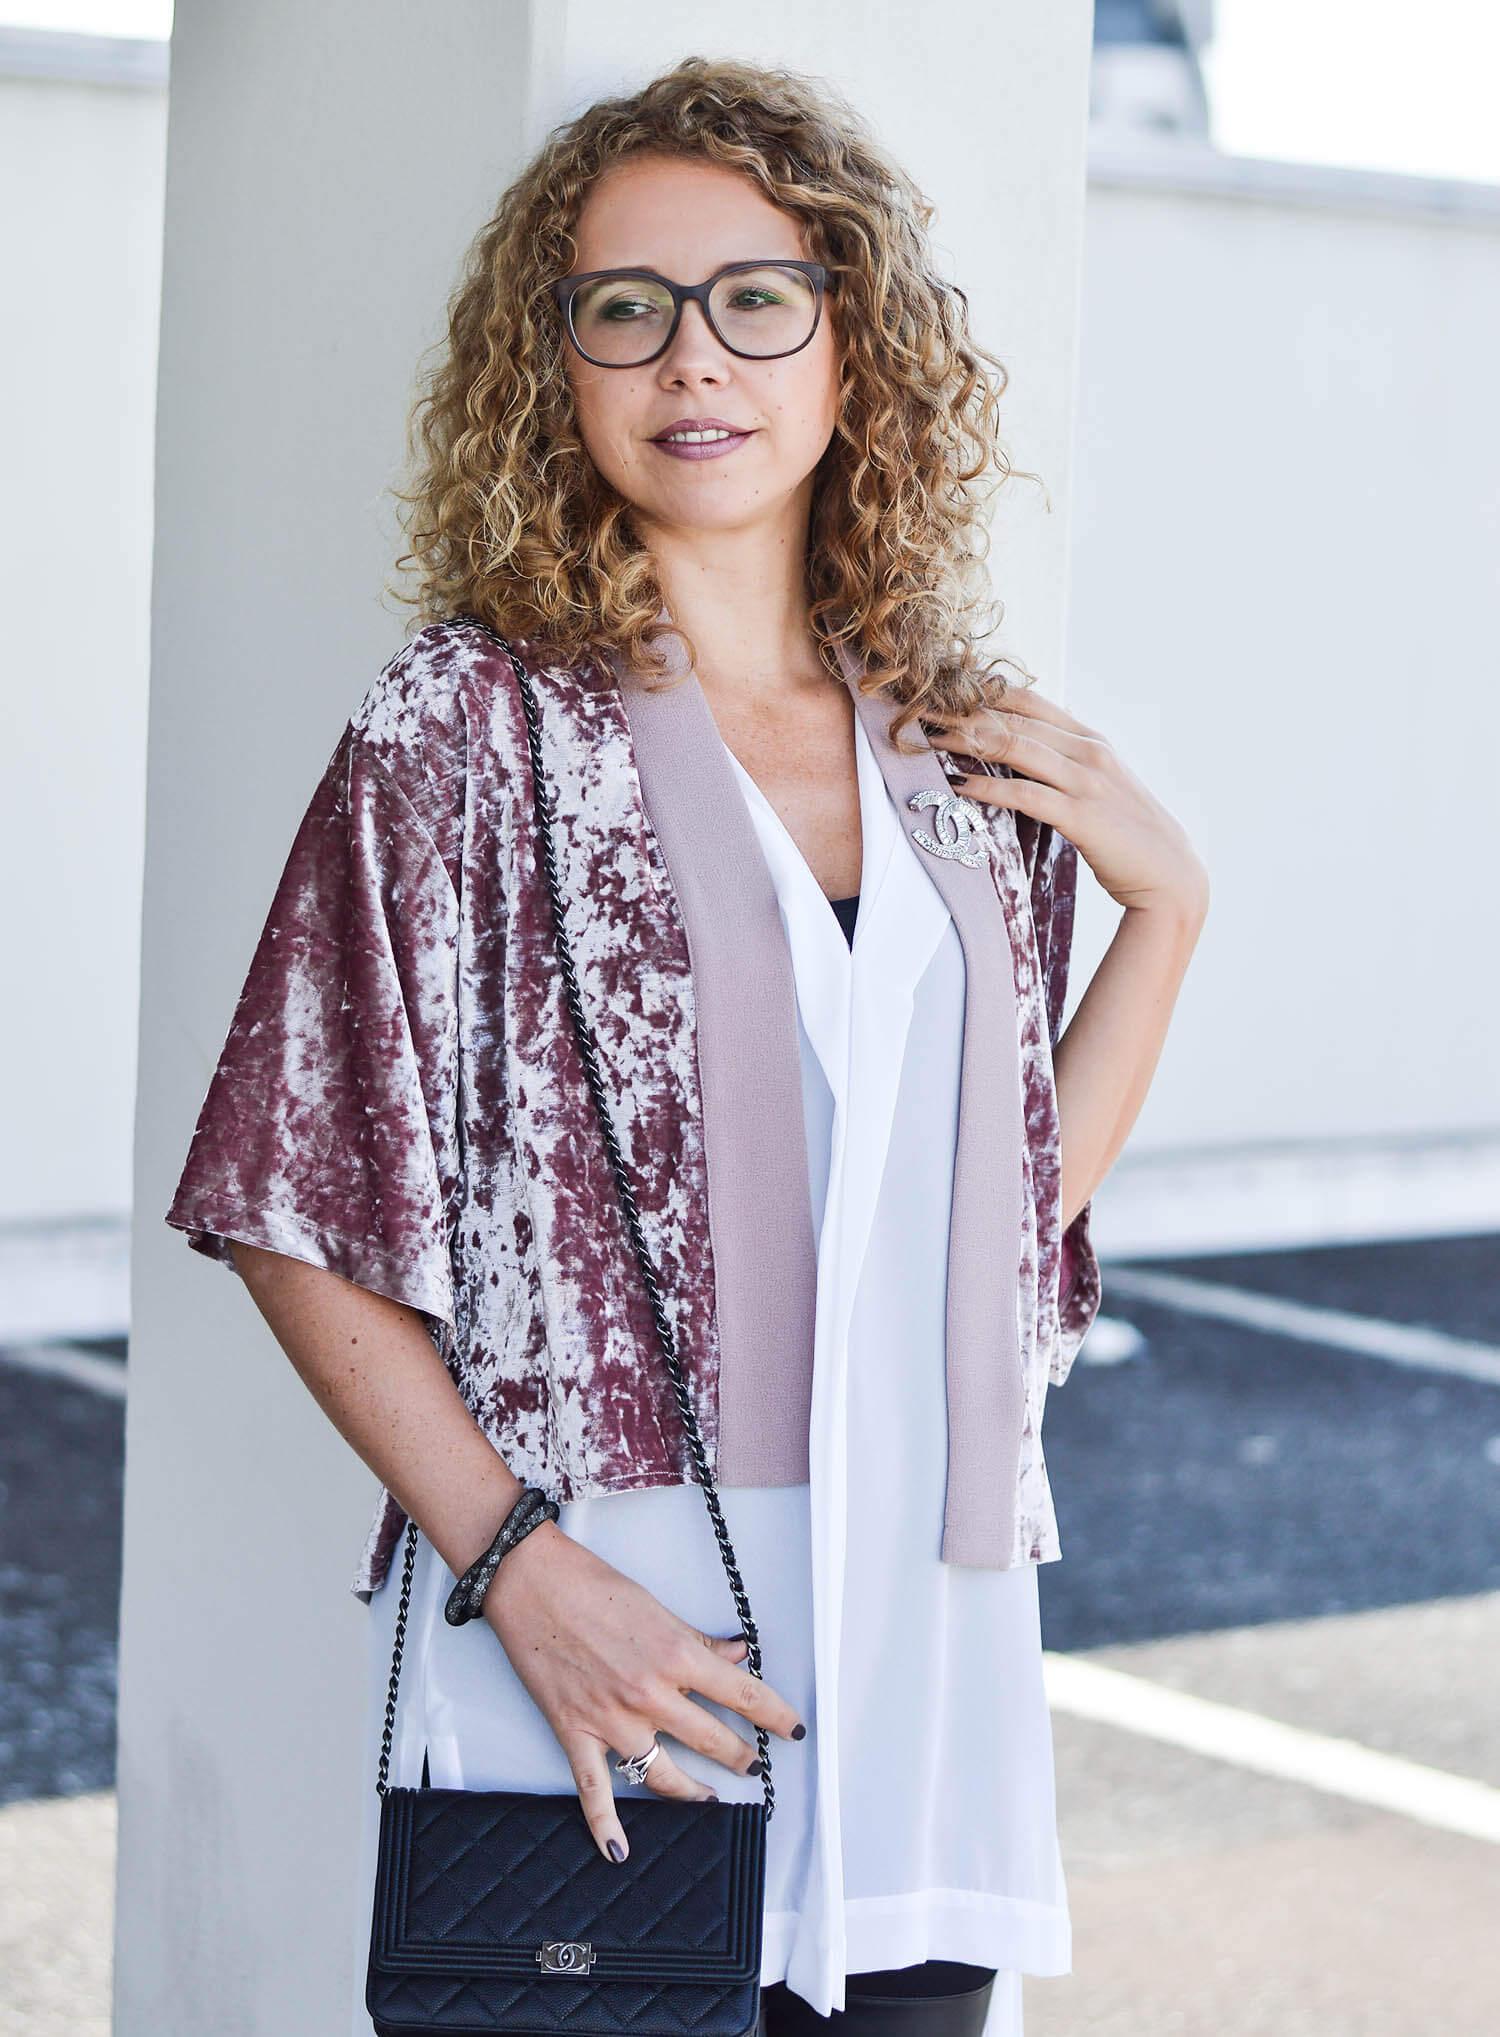 Kationette-fashionblog-nrw-Outfit-Tamaris-Platform-Shoes-Chanel-bag-Long-Blouse-and-Zara-Velvet-Jacket